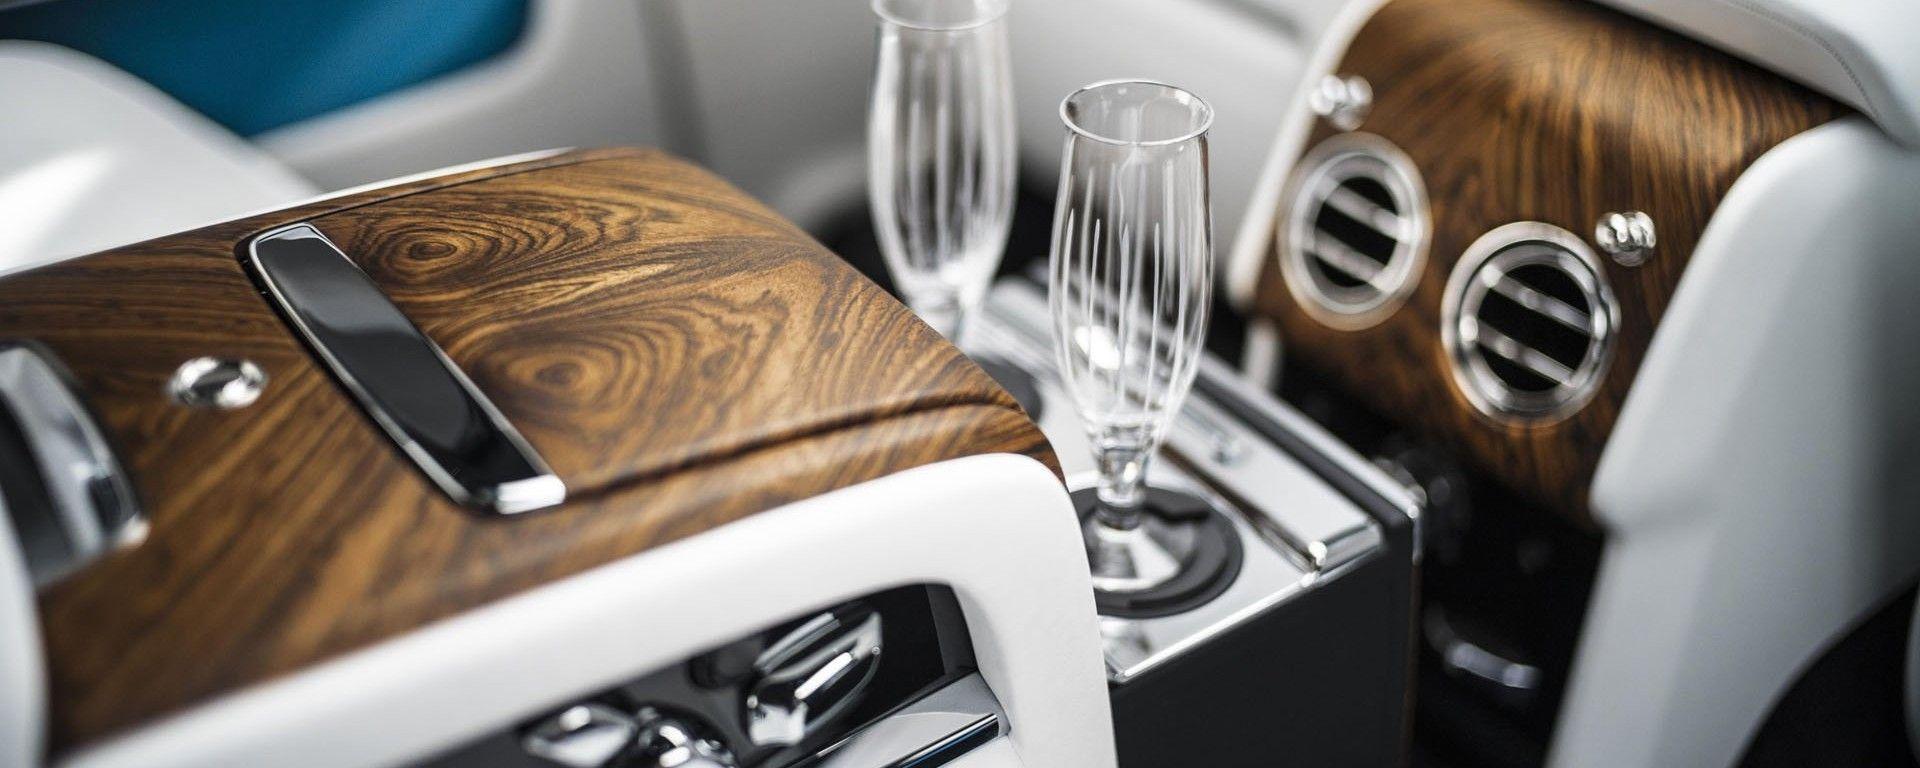 Bicchieri flute a bordo di una Rolls Royce